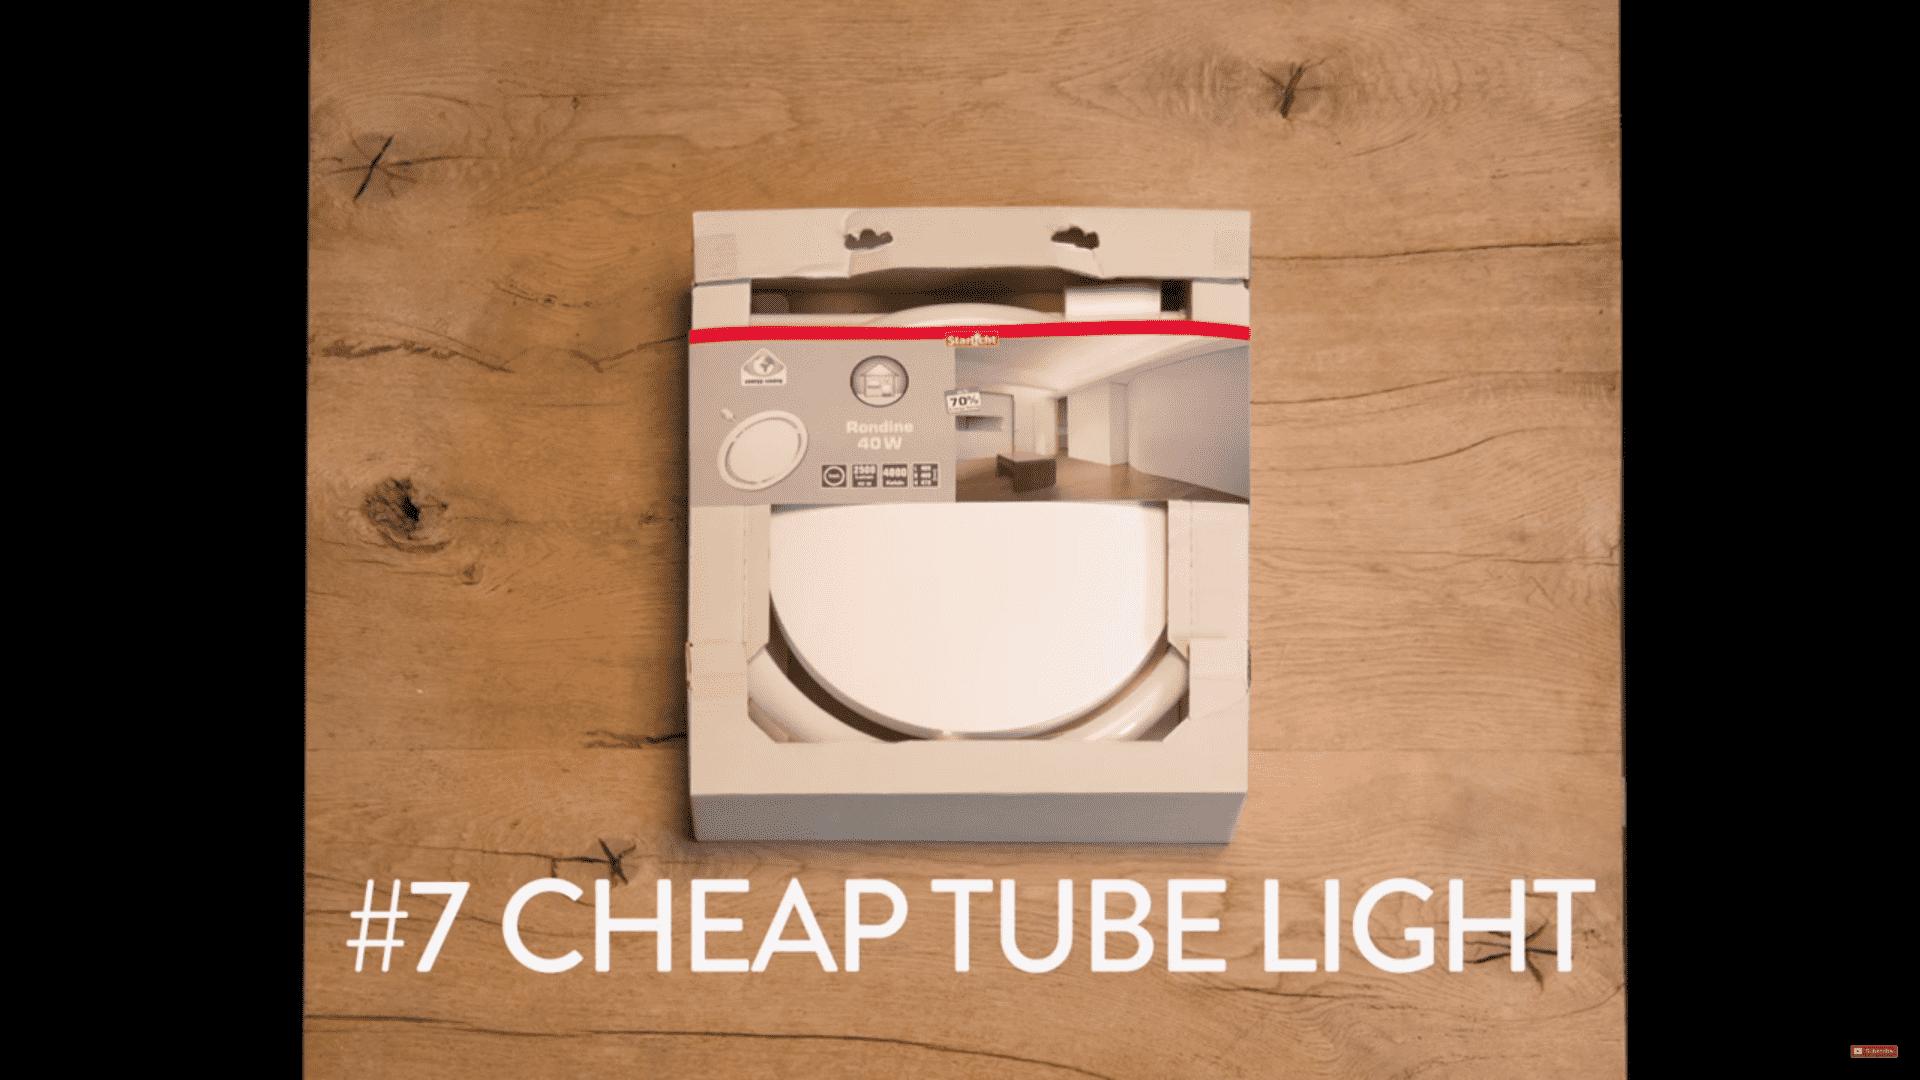 tubelight1 min image